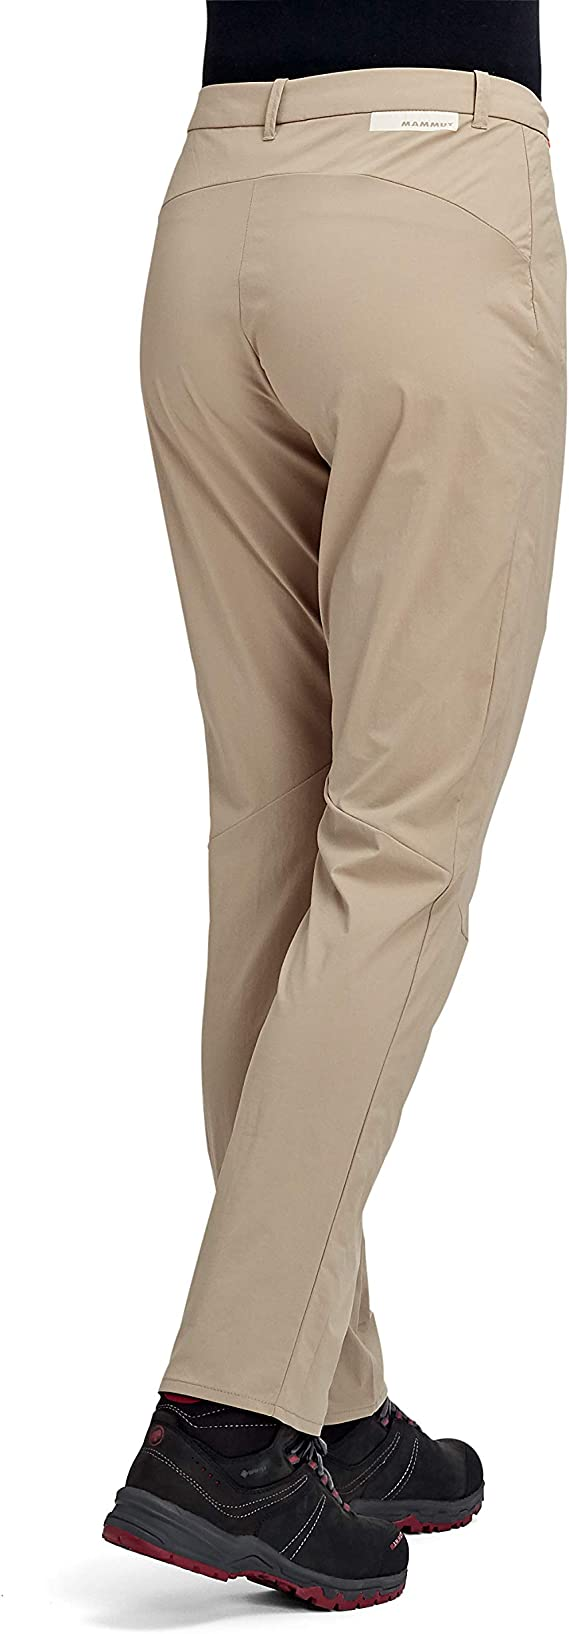 Mammut Hose Capella Pants Pantalones Mujer